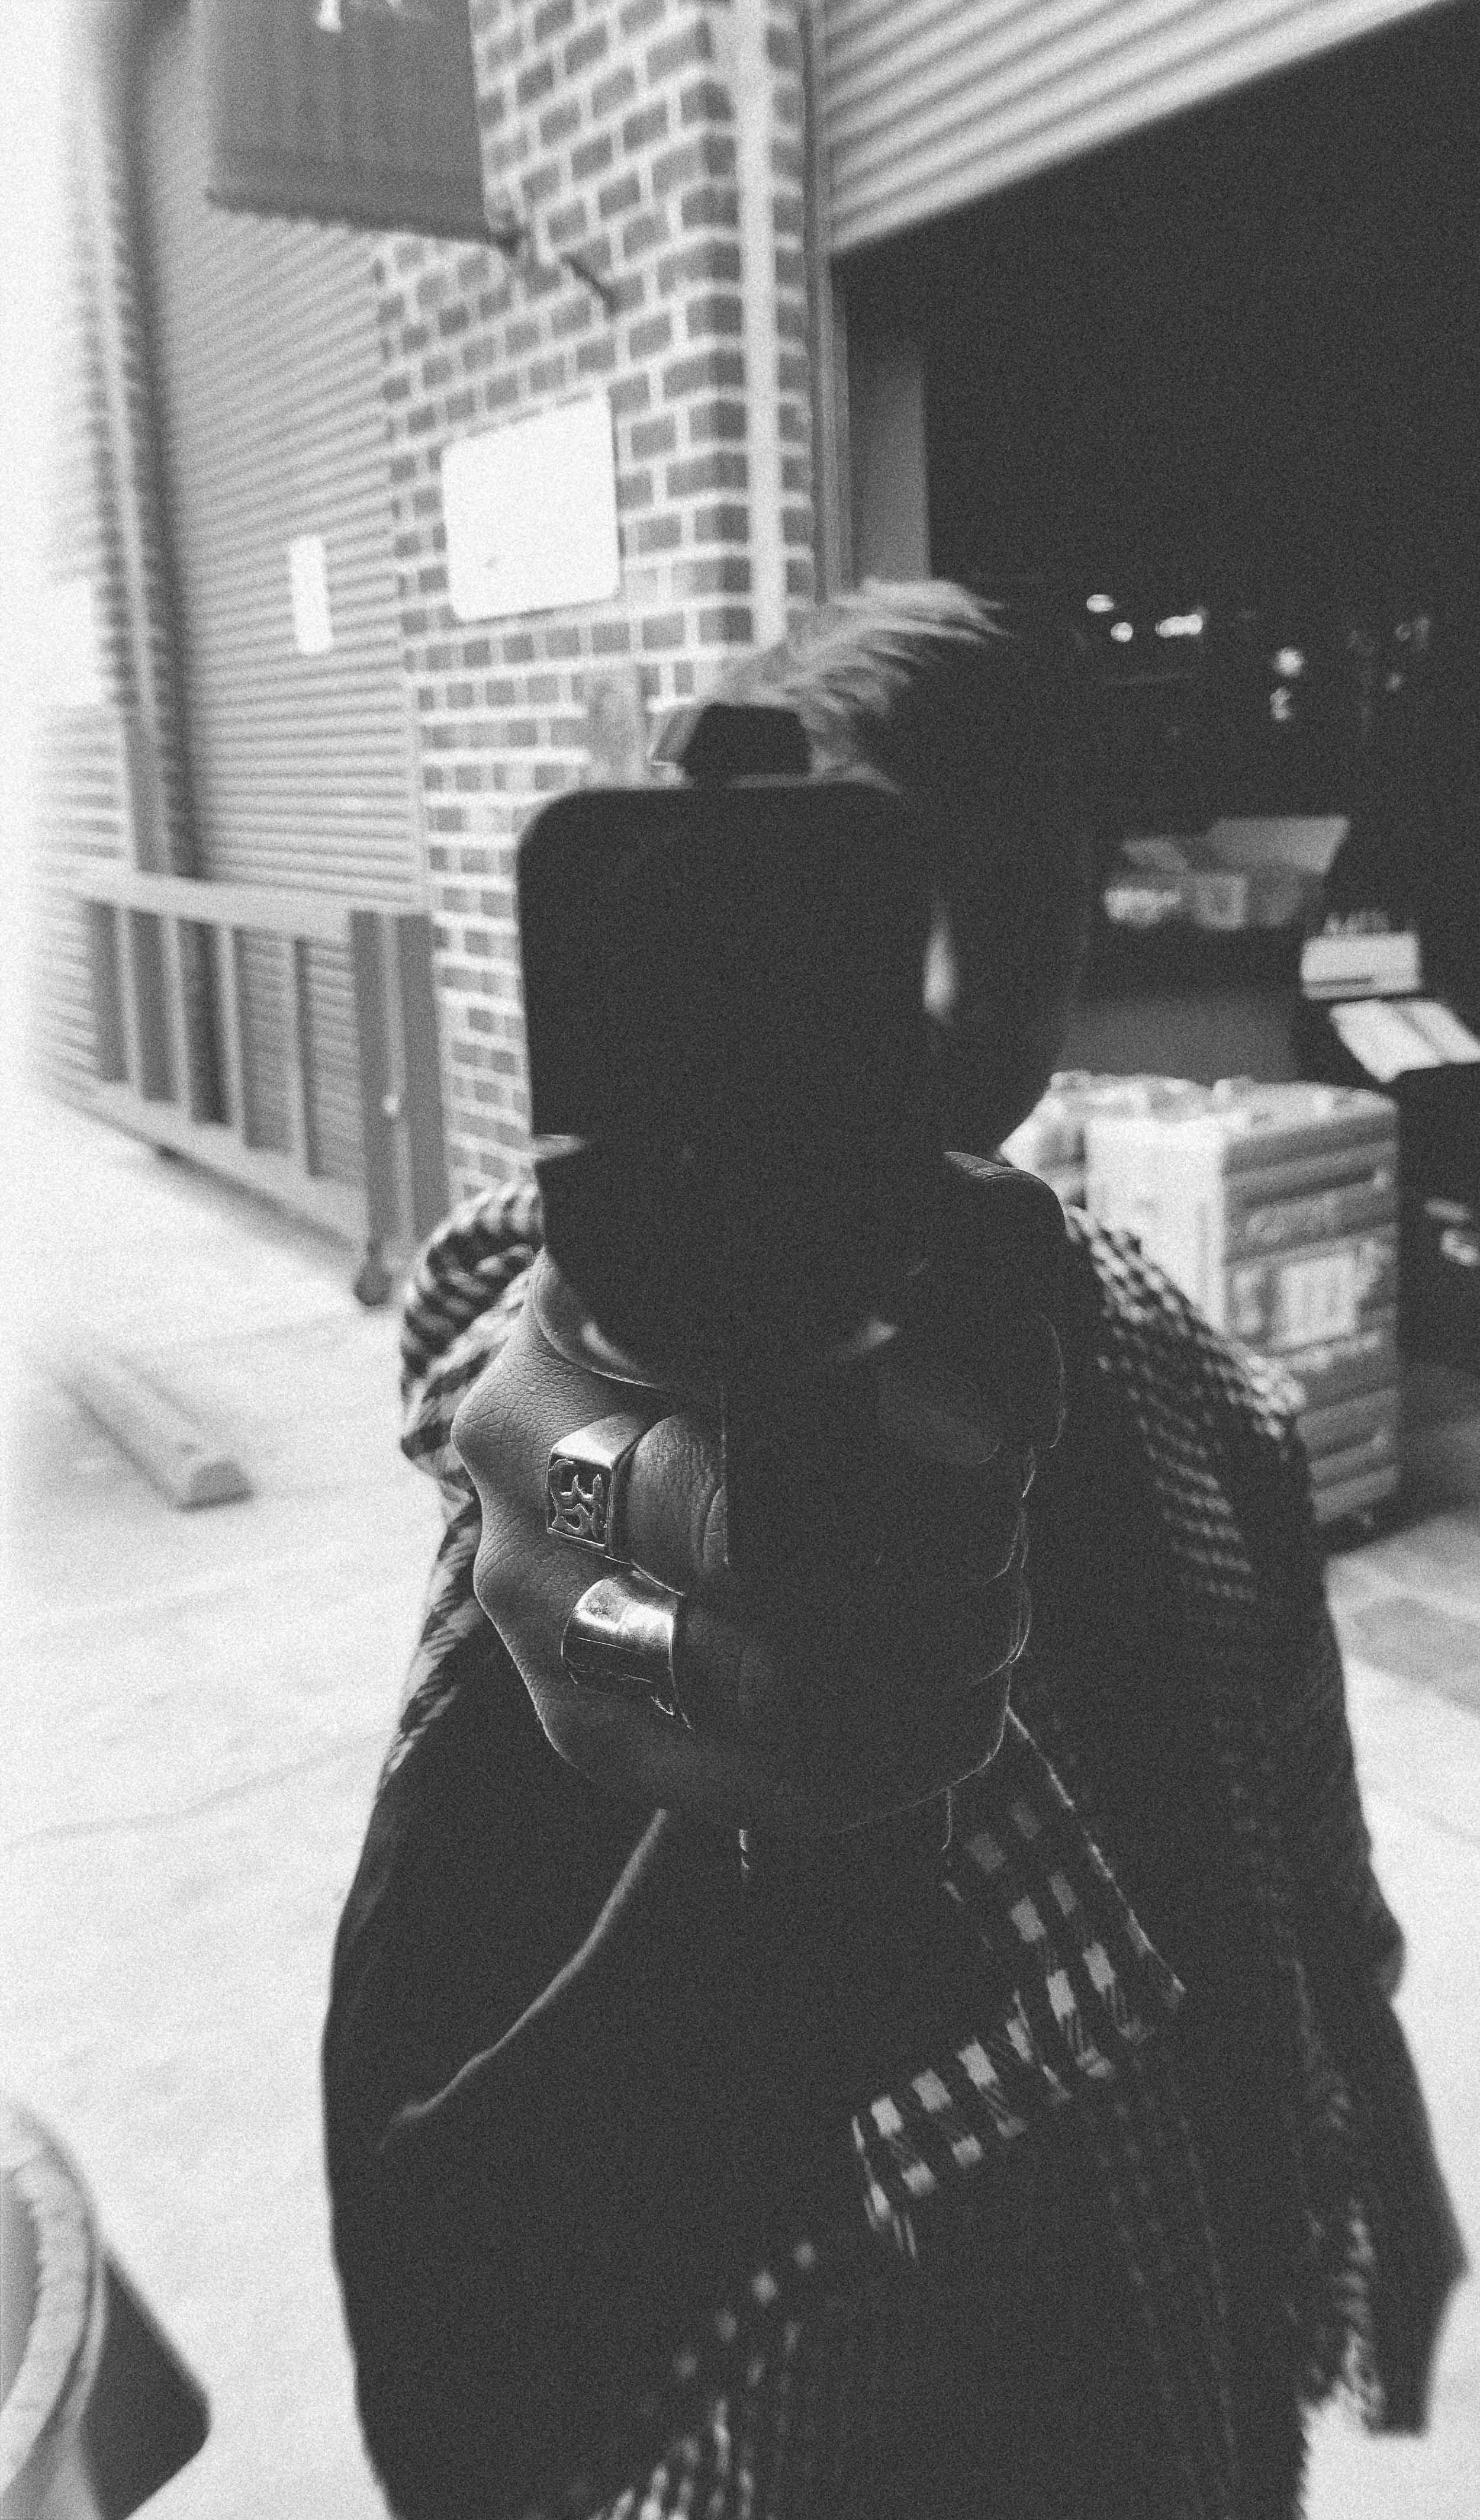 film-archive-kc.locke-93.jpg